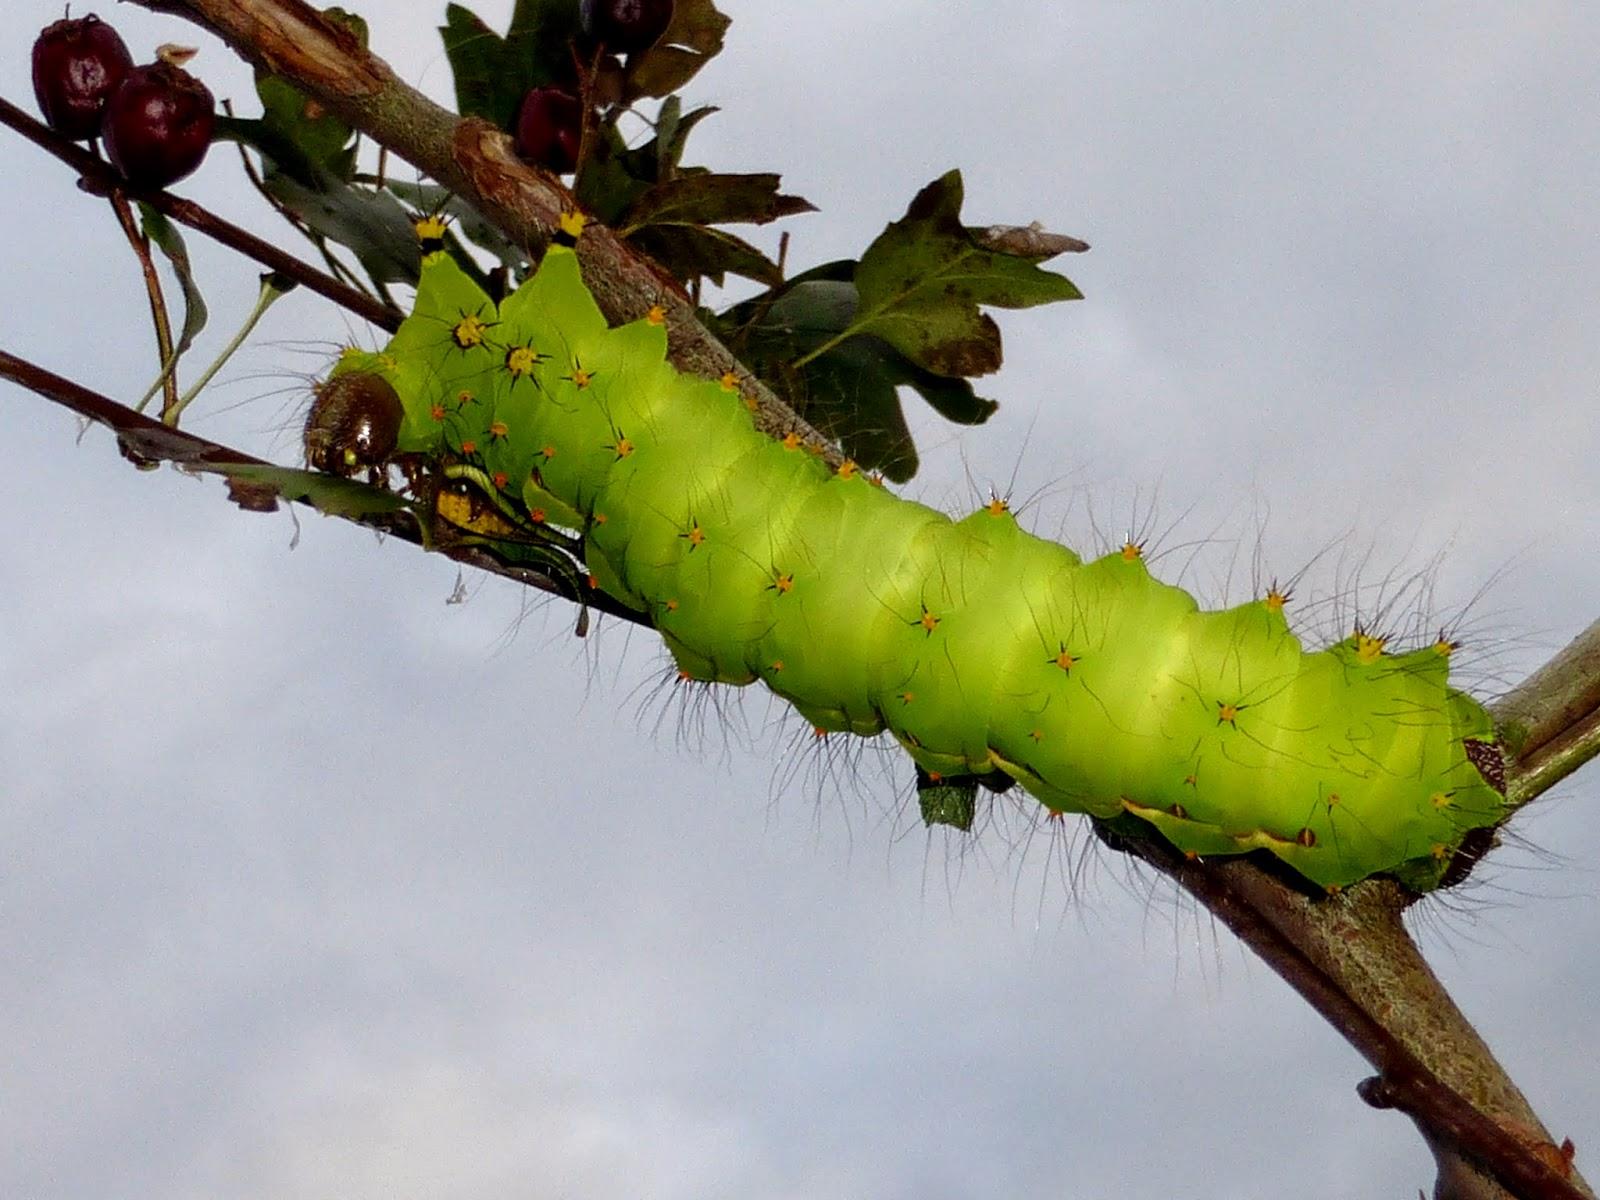 Actias selene caterpillar